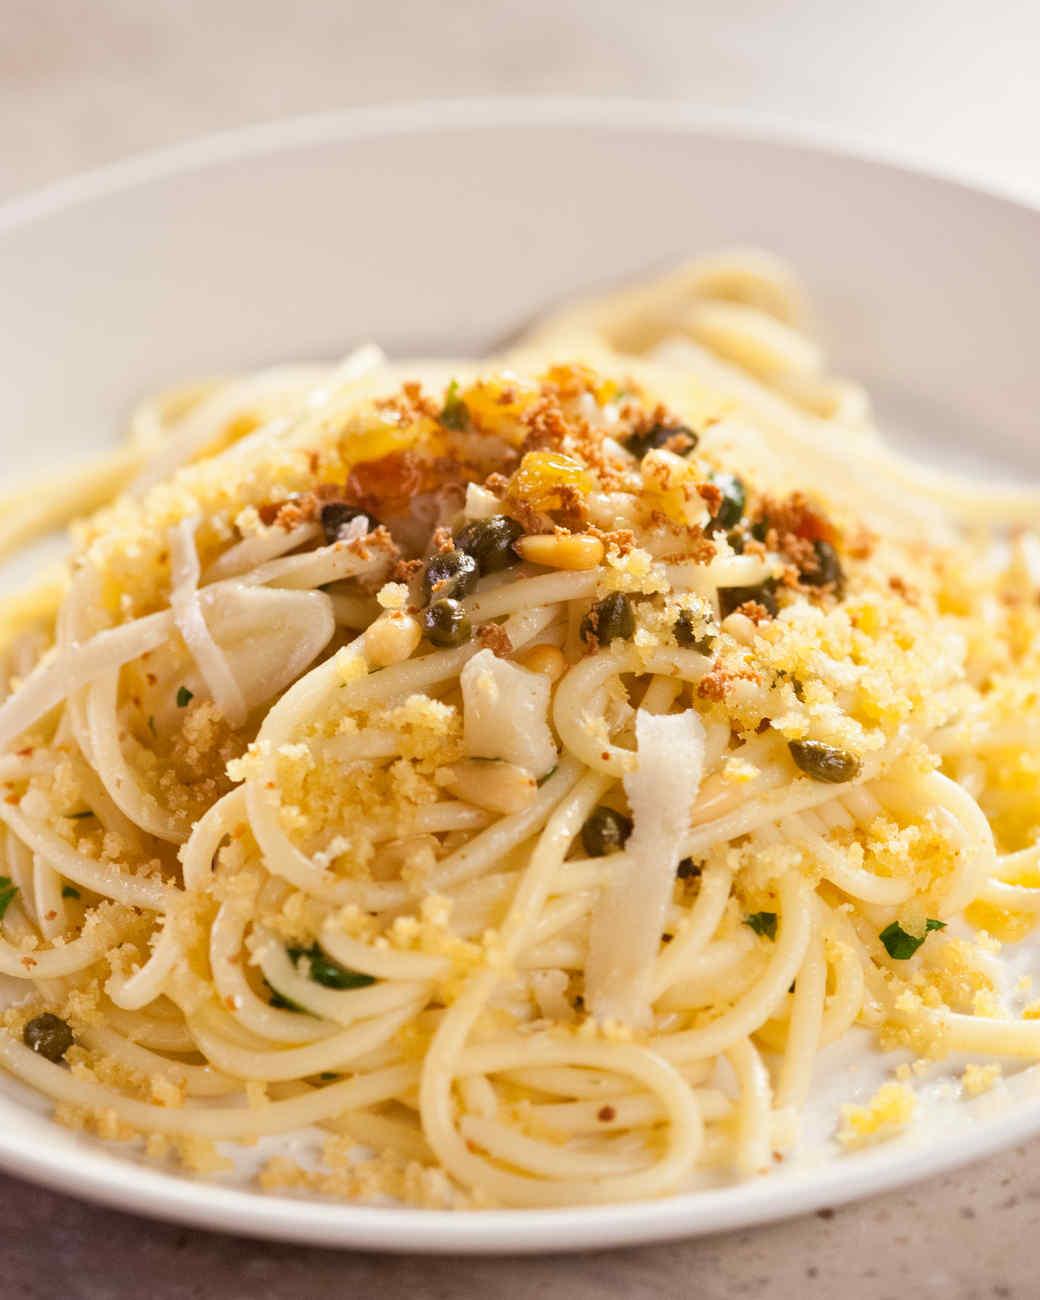 martha-cooking-school-pasta-sauces-bucatini-breadcrumbs-cs2004-0691.jpg